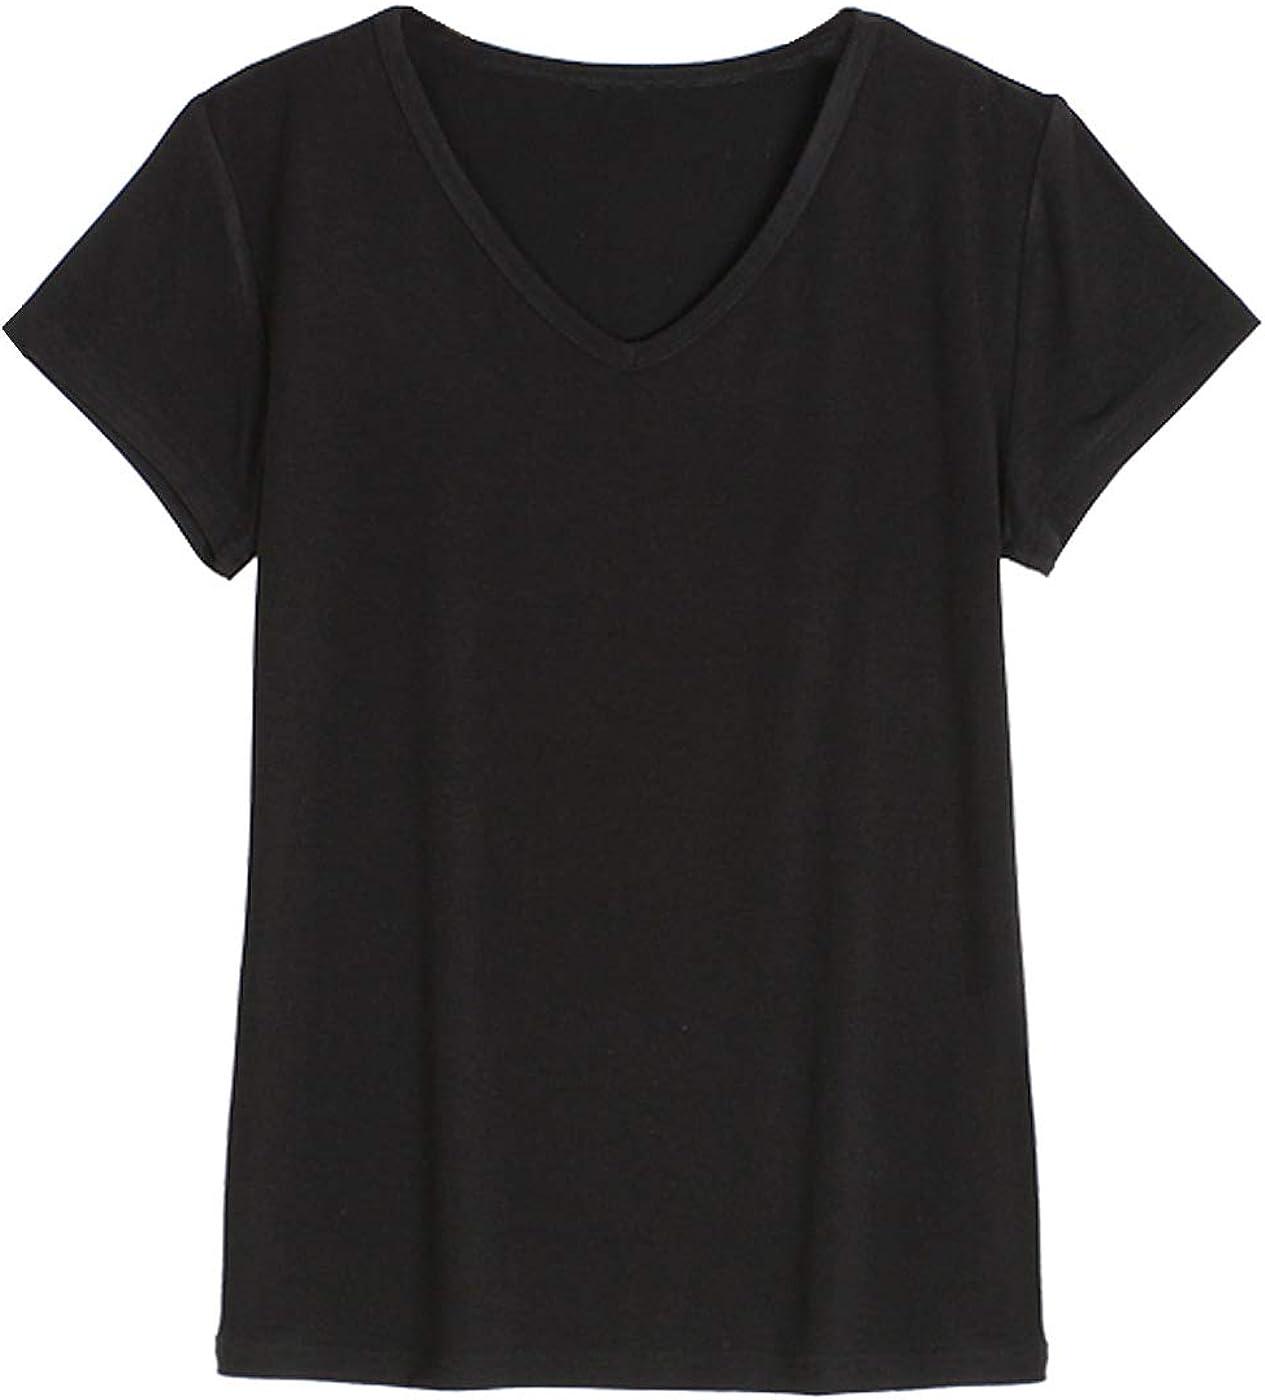 Jusfitsu Summer Women Pajama Set Short Sleeve Modal Sleepwear Top and Short Cotton Soft Loungewear Elastic